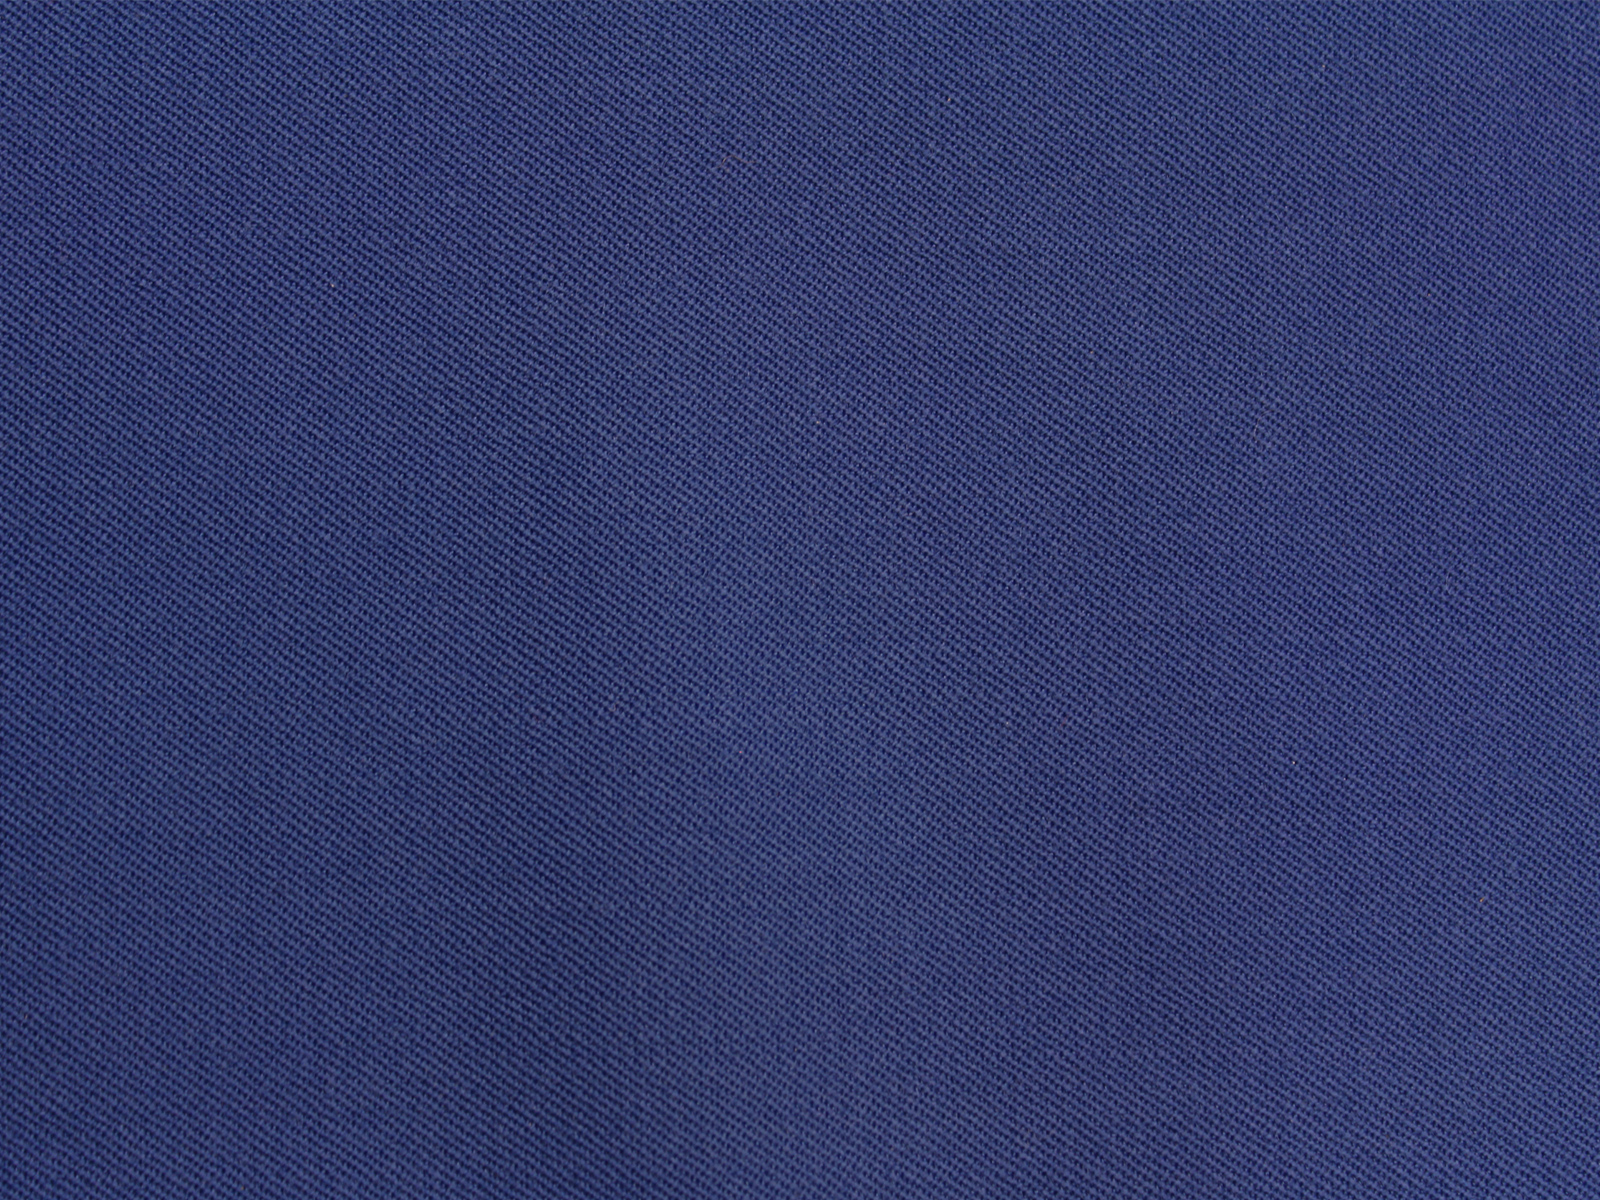 00409 Flanella Galitzine   Cobalto